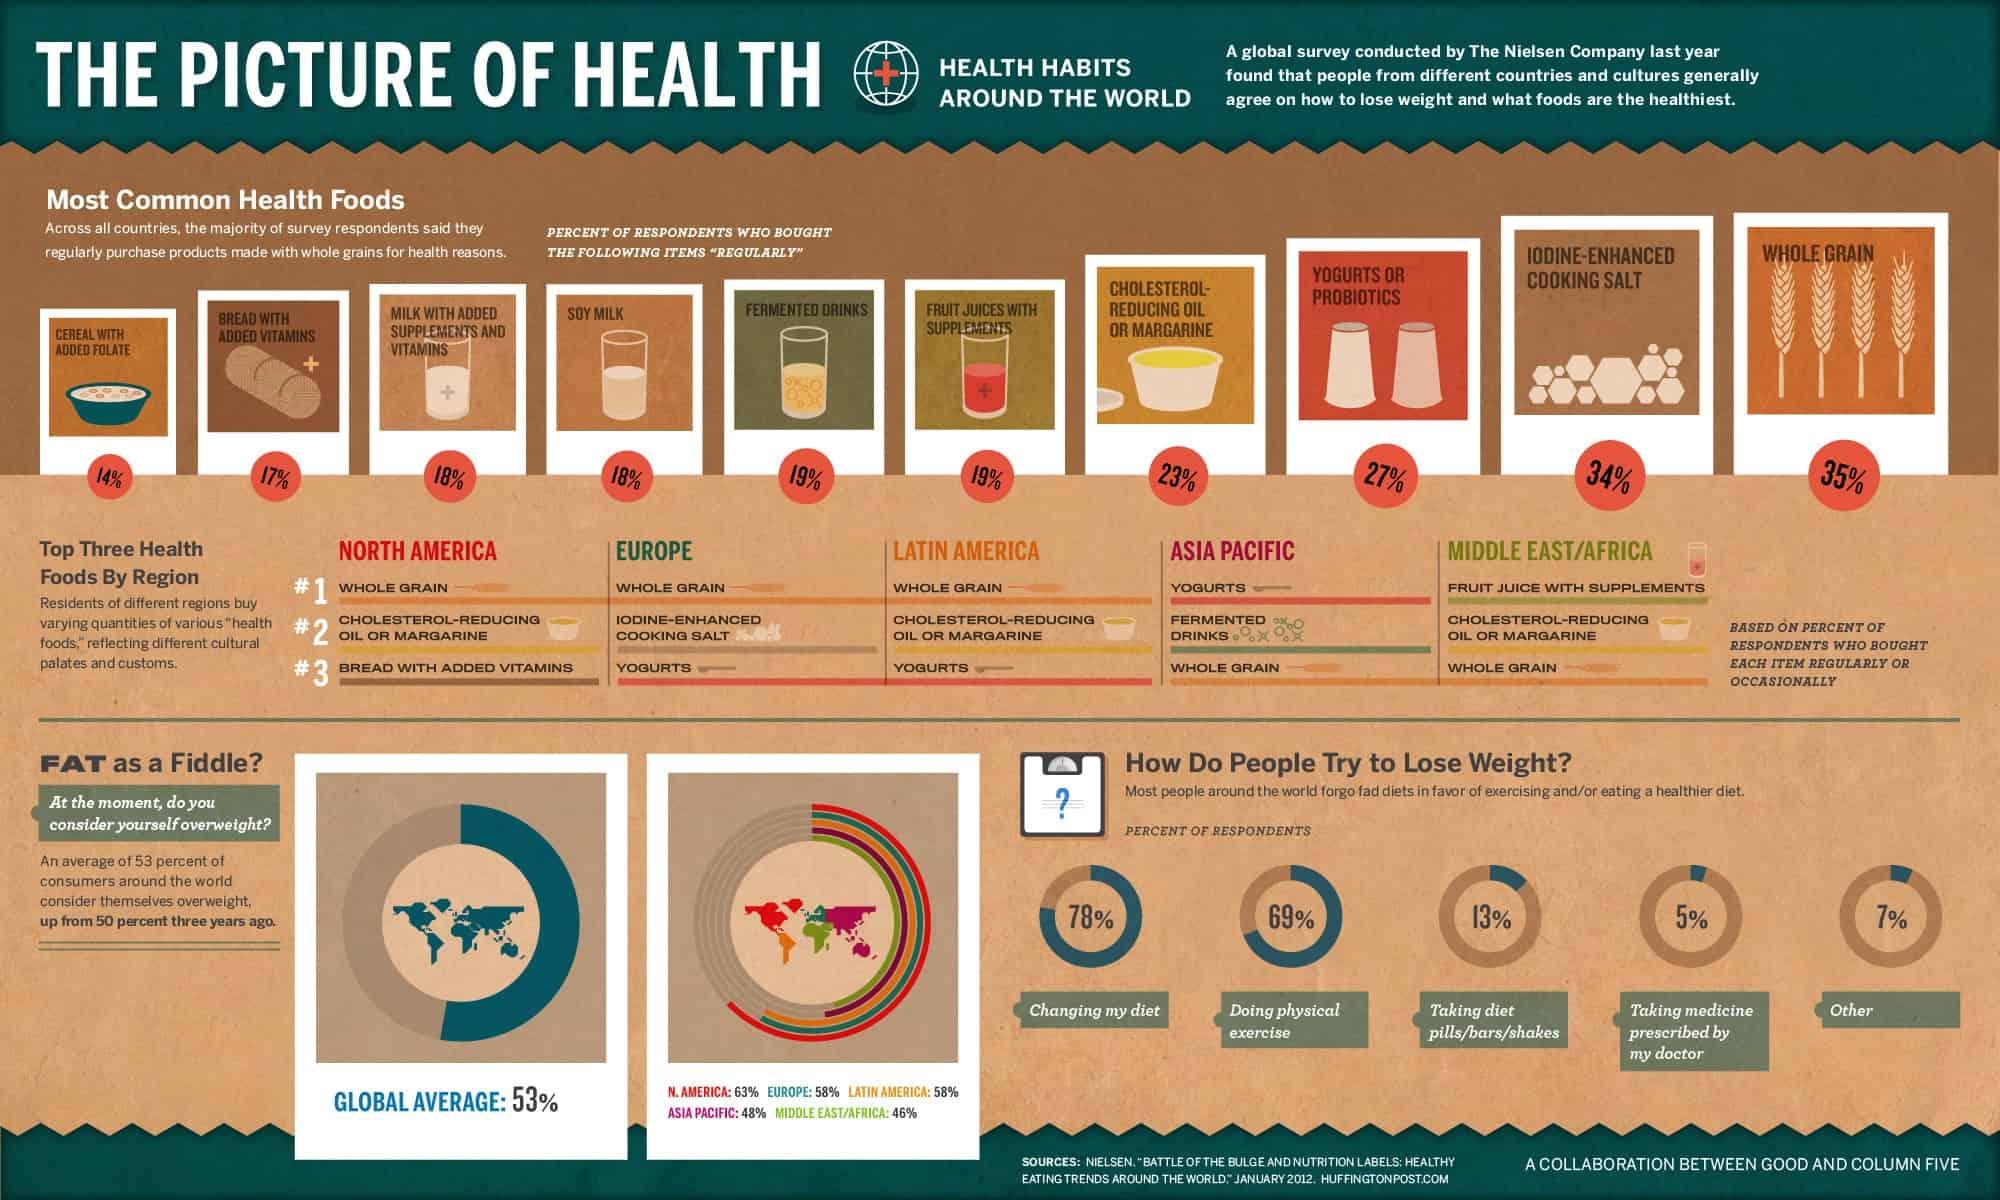 Environmental Health And Safety News Health Habits